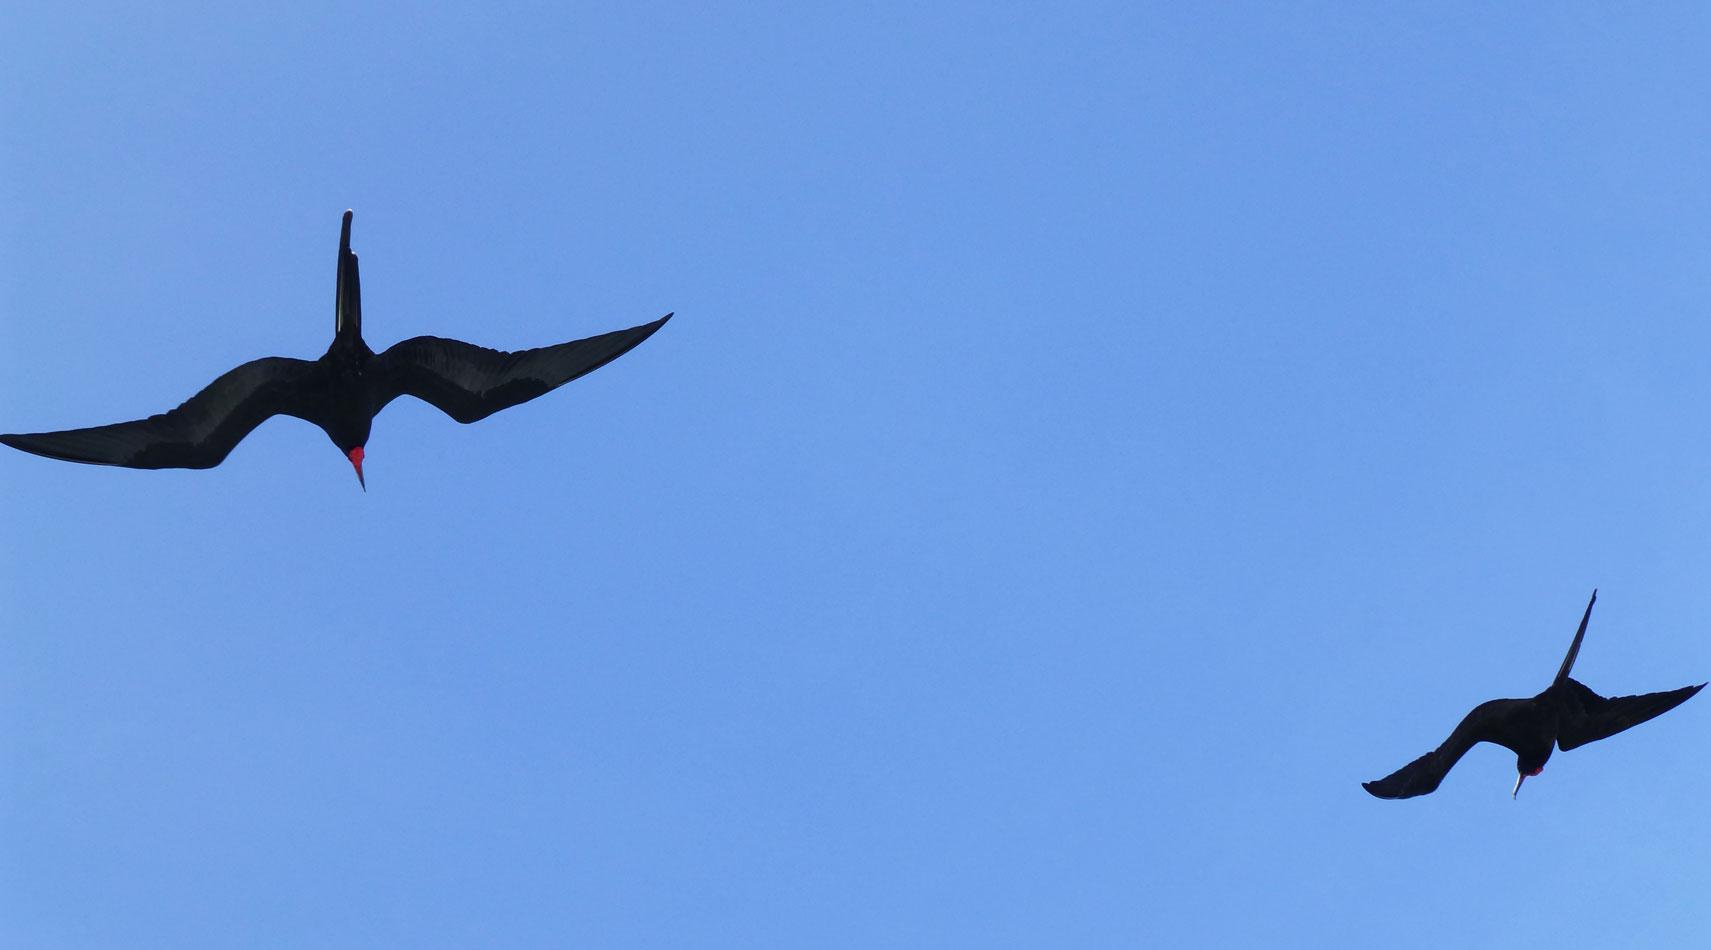 More frigatebirds